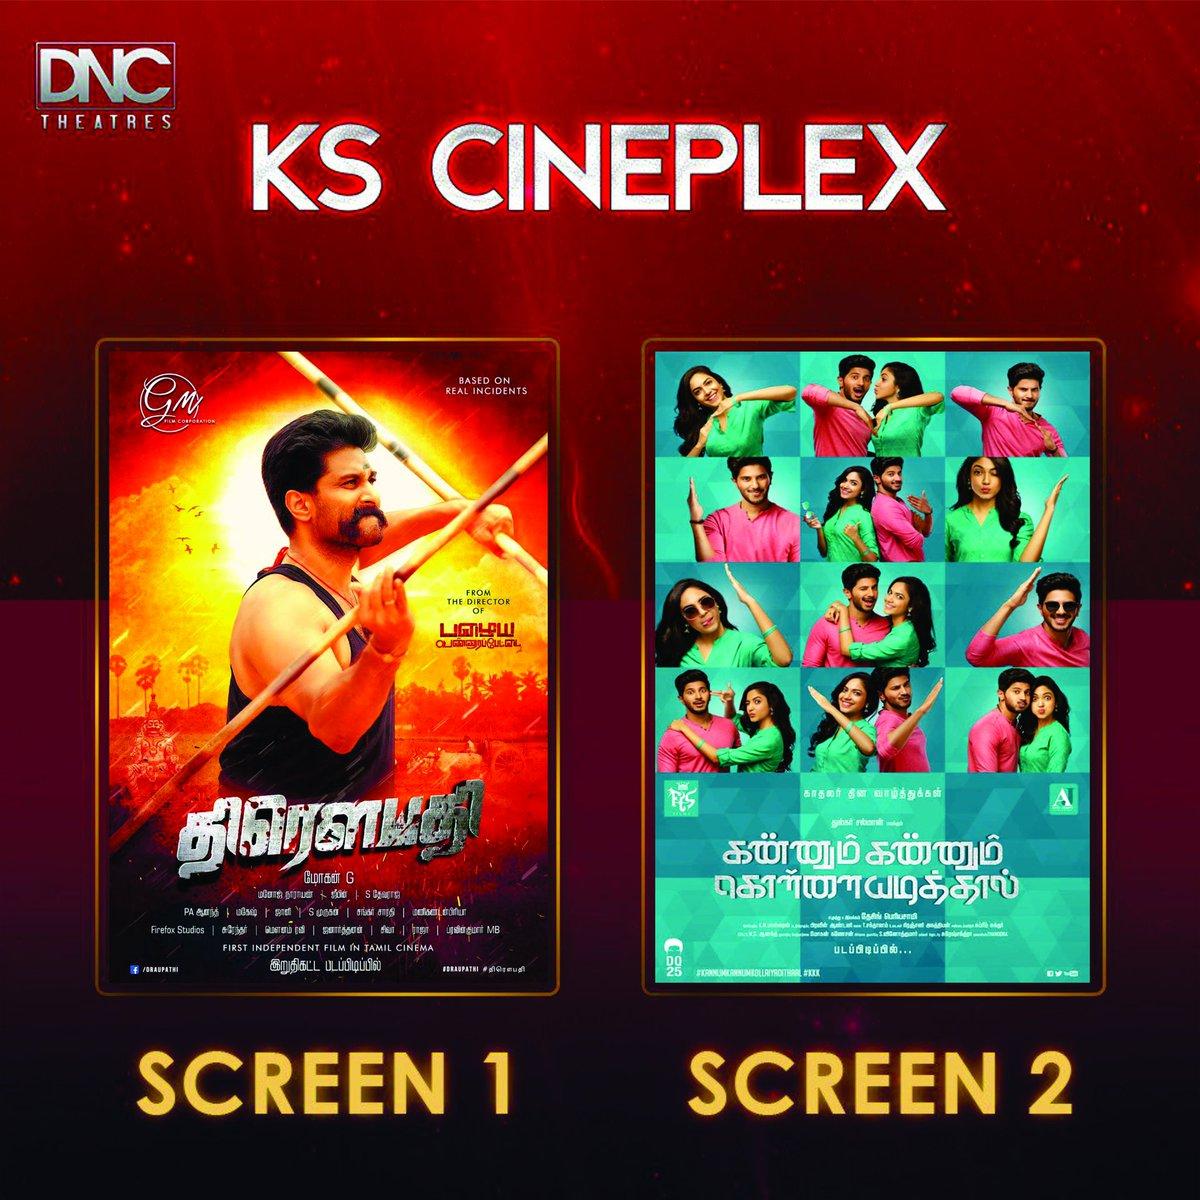 This week at நம்ம KS Cineplex!!  A mush watch social political drama in Screen 1 & A breezy romantic journey in Screen 2!!  Grab your tickets now!  @richardrishi @dulQuer @riturv @RakshanVJ #திரெளபதி #KannumKannumKollaiyadithal #KKKFromTodaypic.twitter.com/8d2R3xMn1I